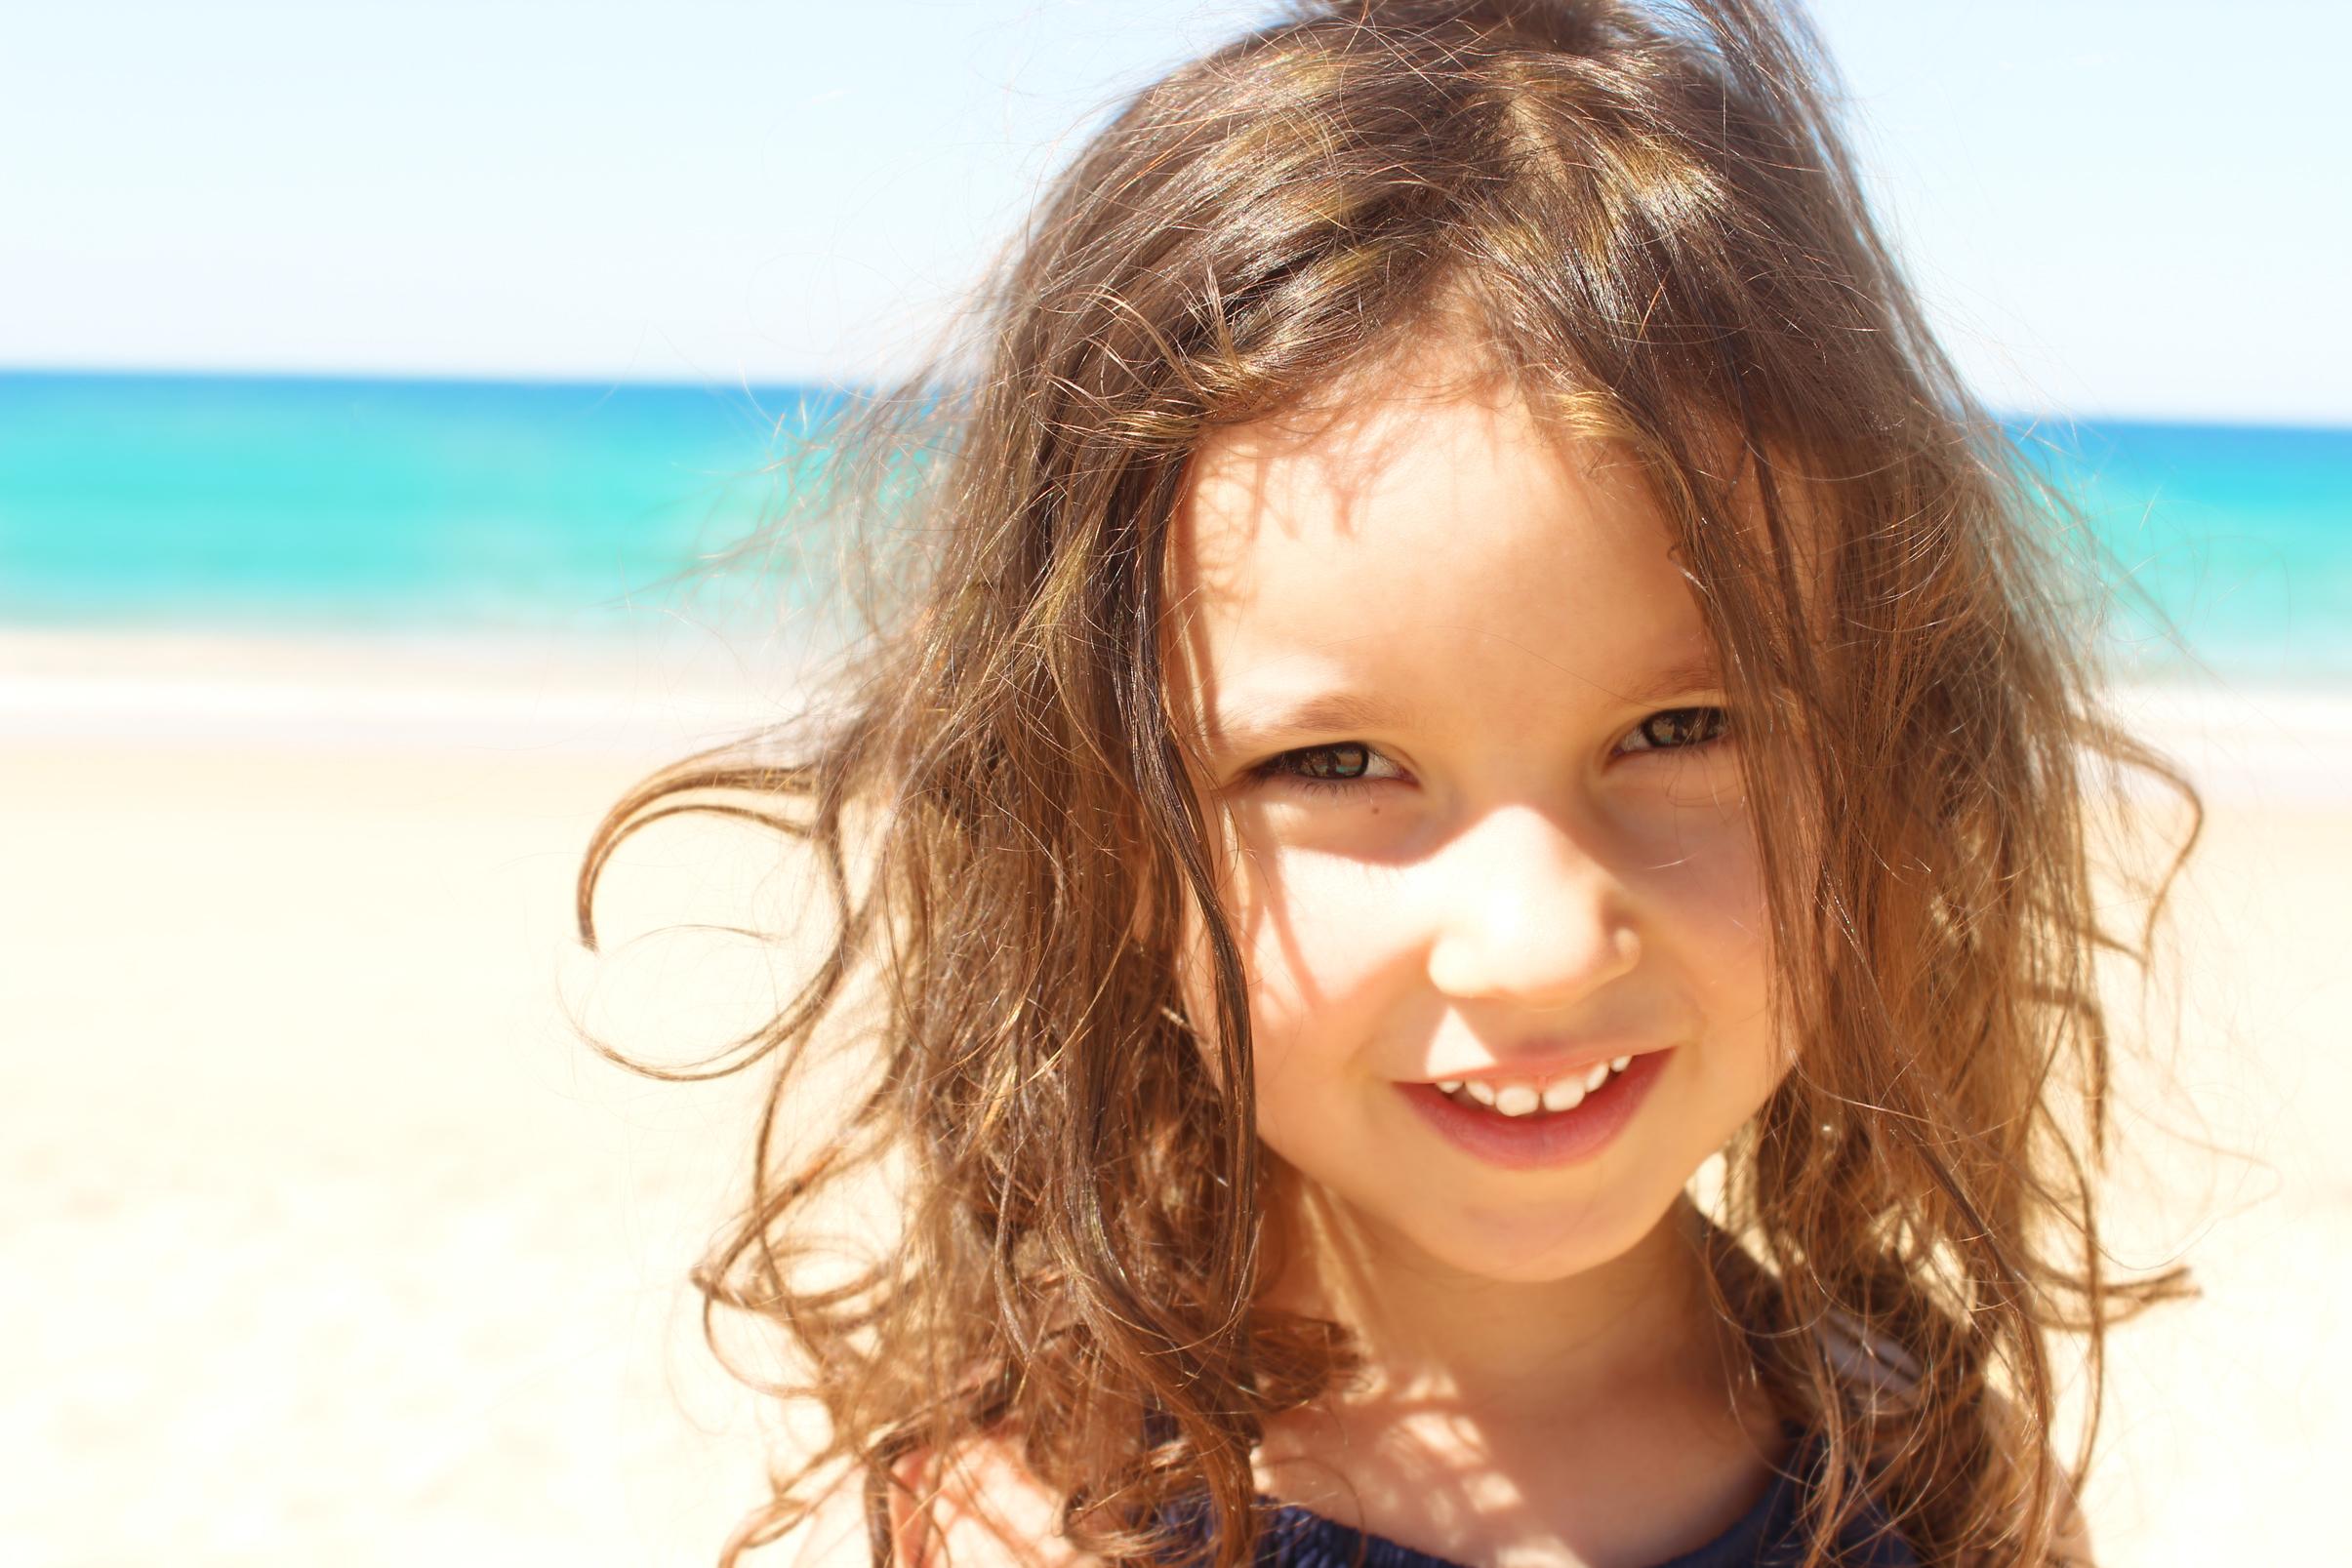 Beautiful sweet girl smiling photo